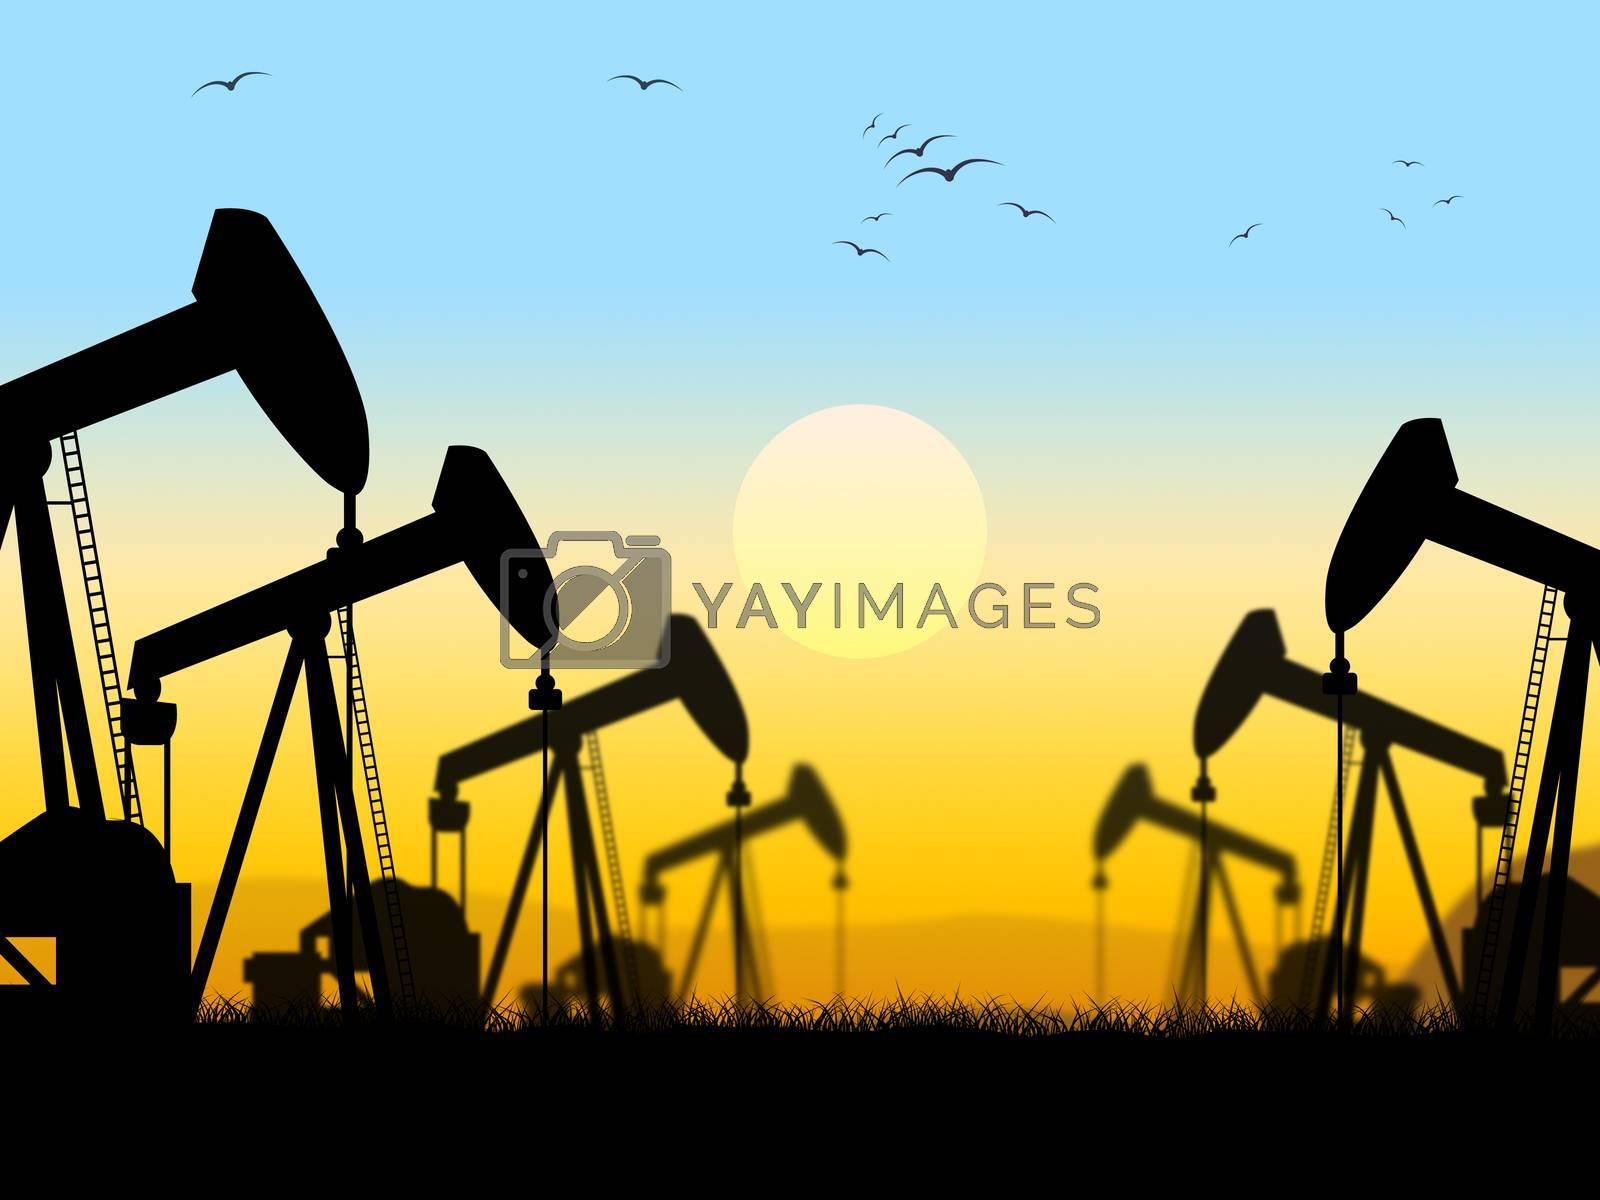 Oil Wells Shows Nonrenewable Fuel And Exploration by stuartmiles